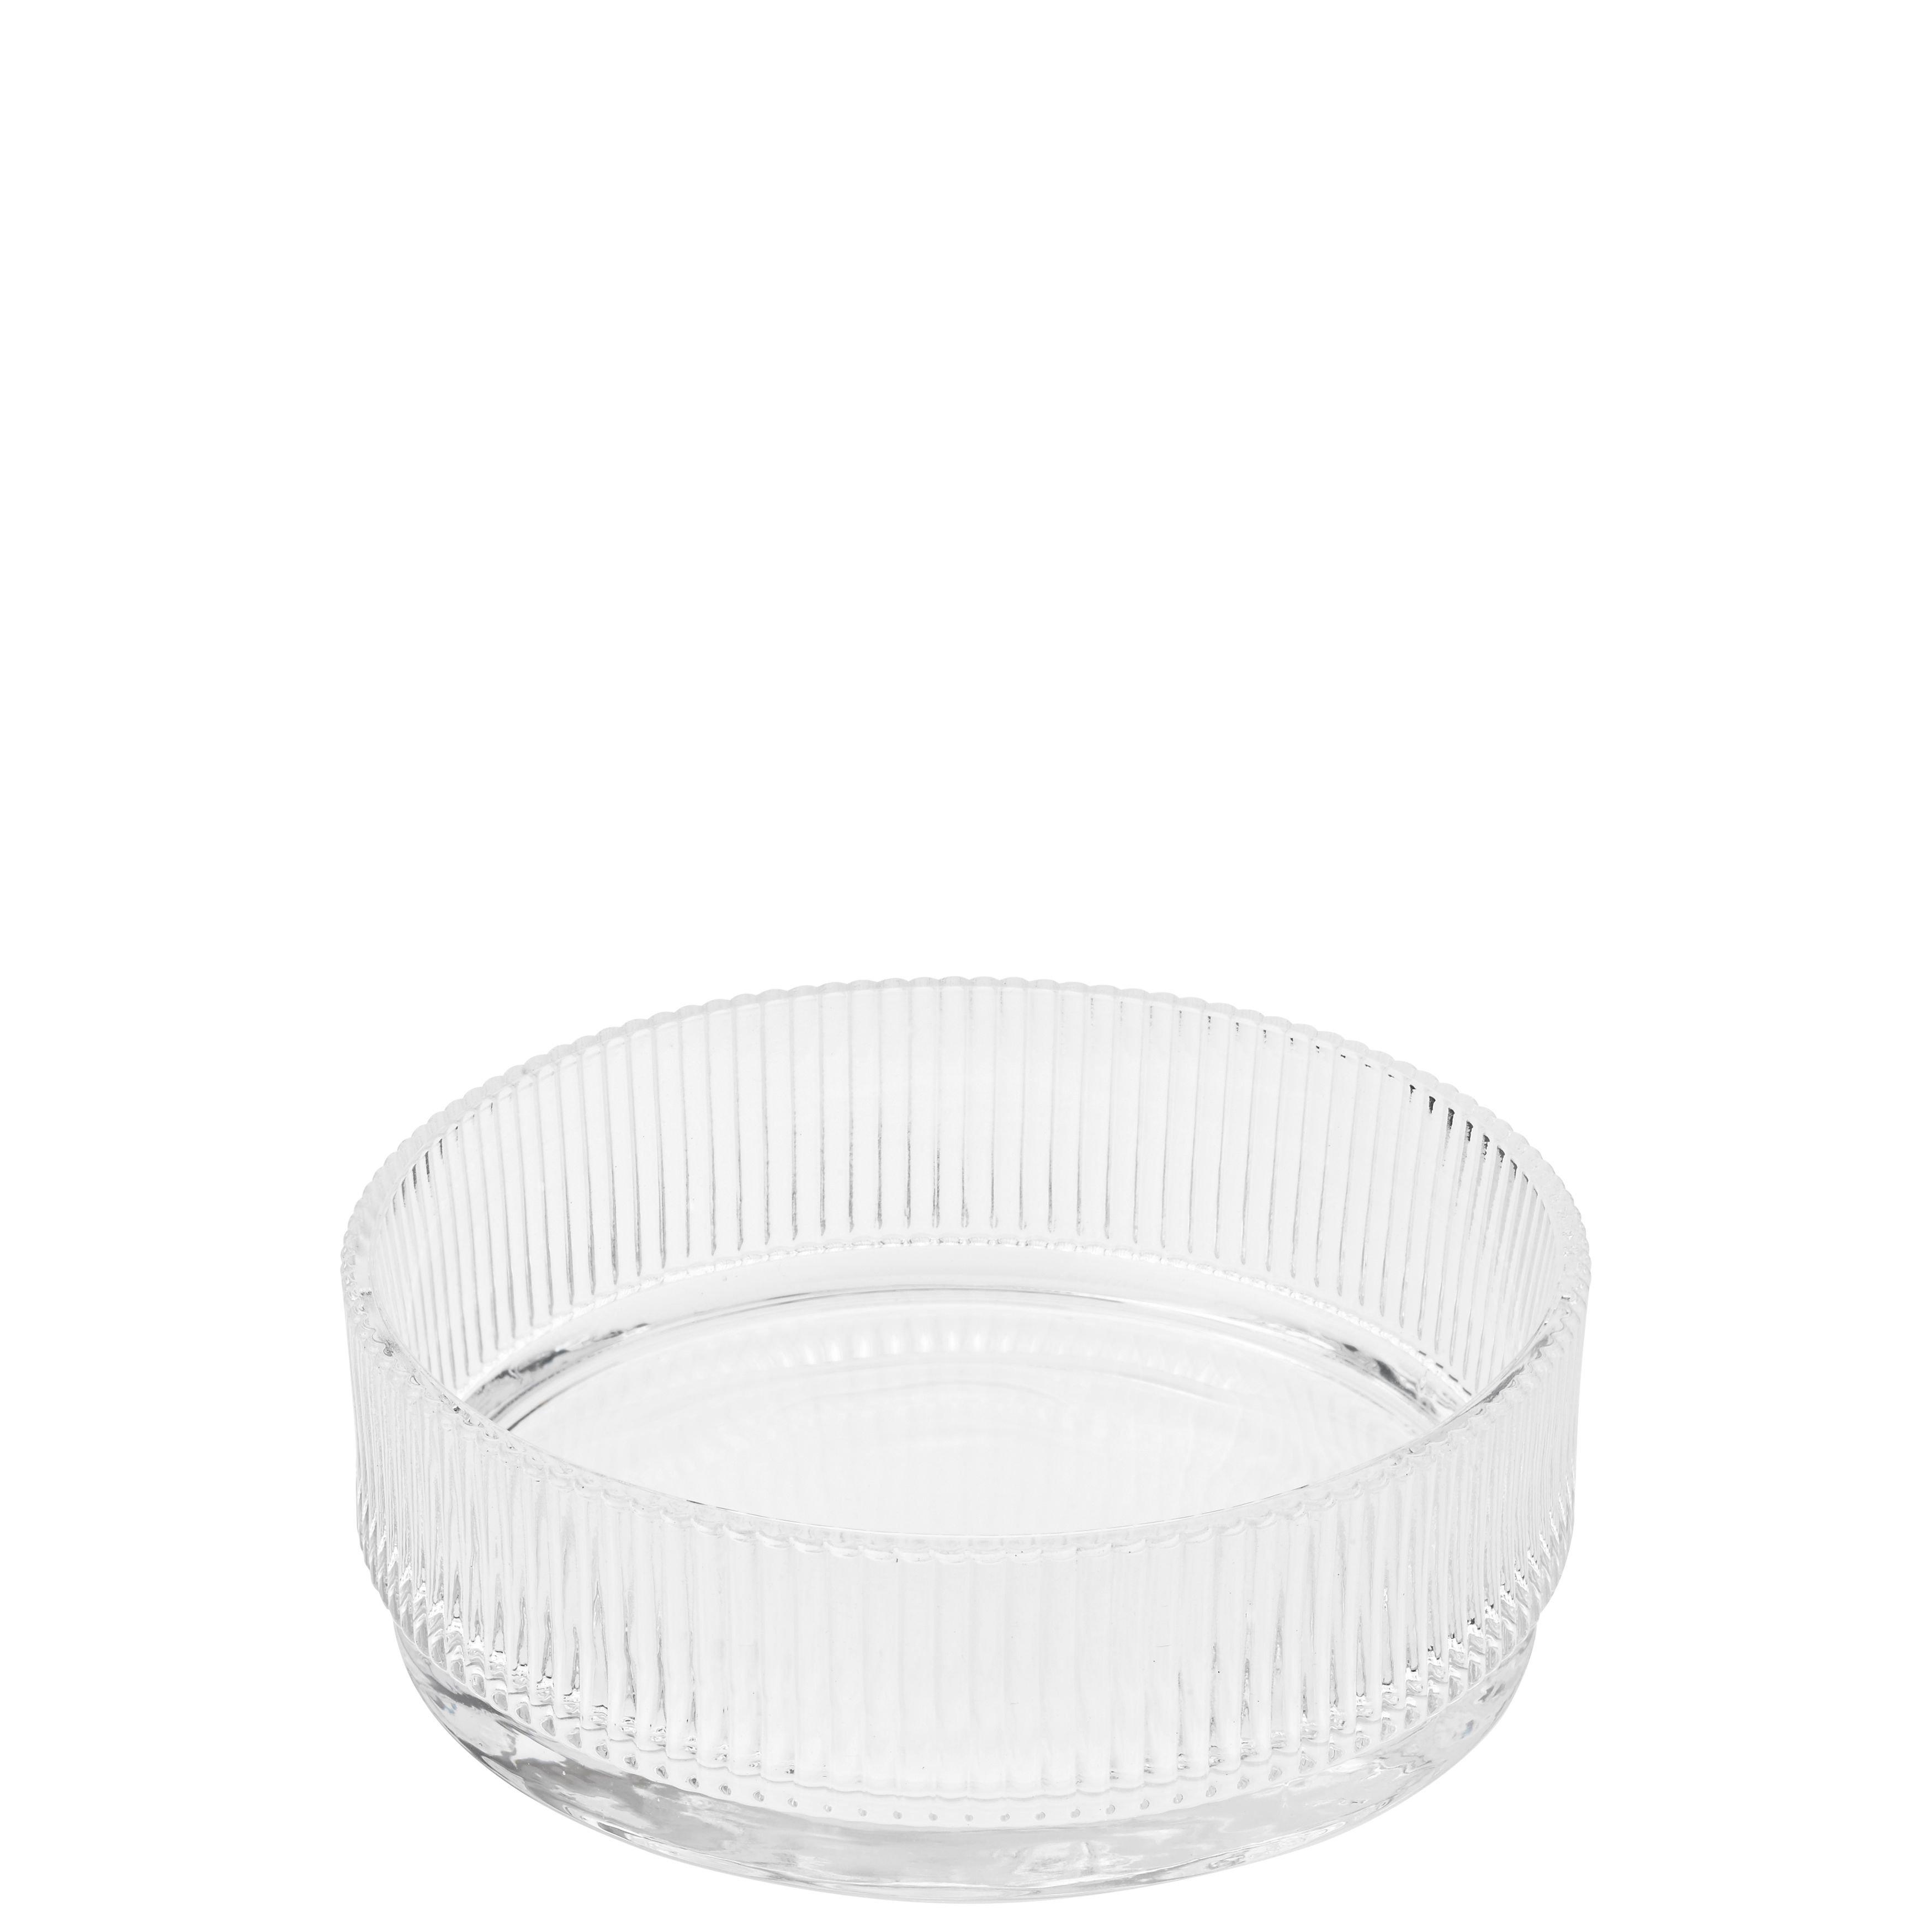 Stelton - Pilastro Serving Bowl - Small (x-505)